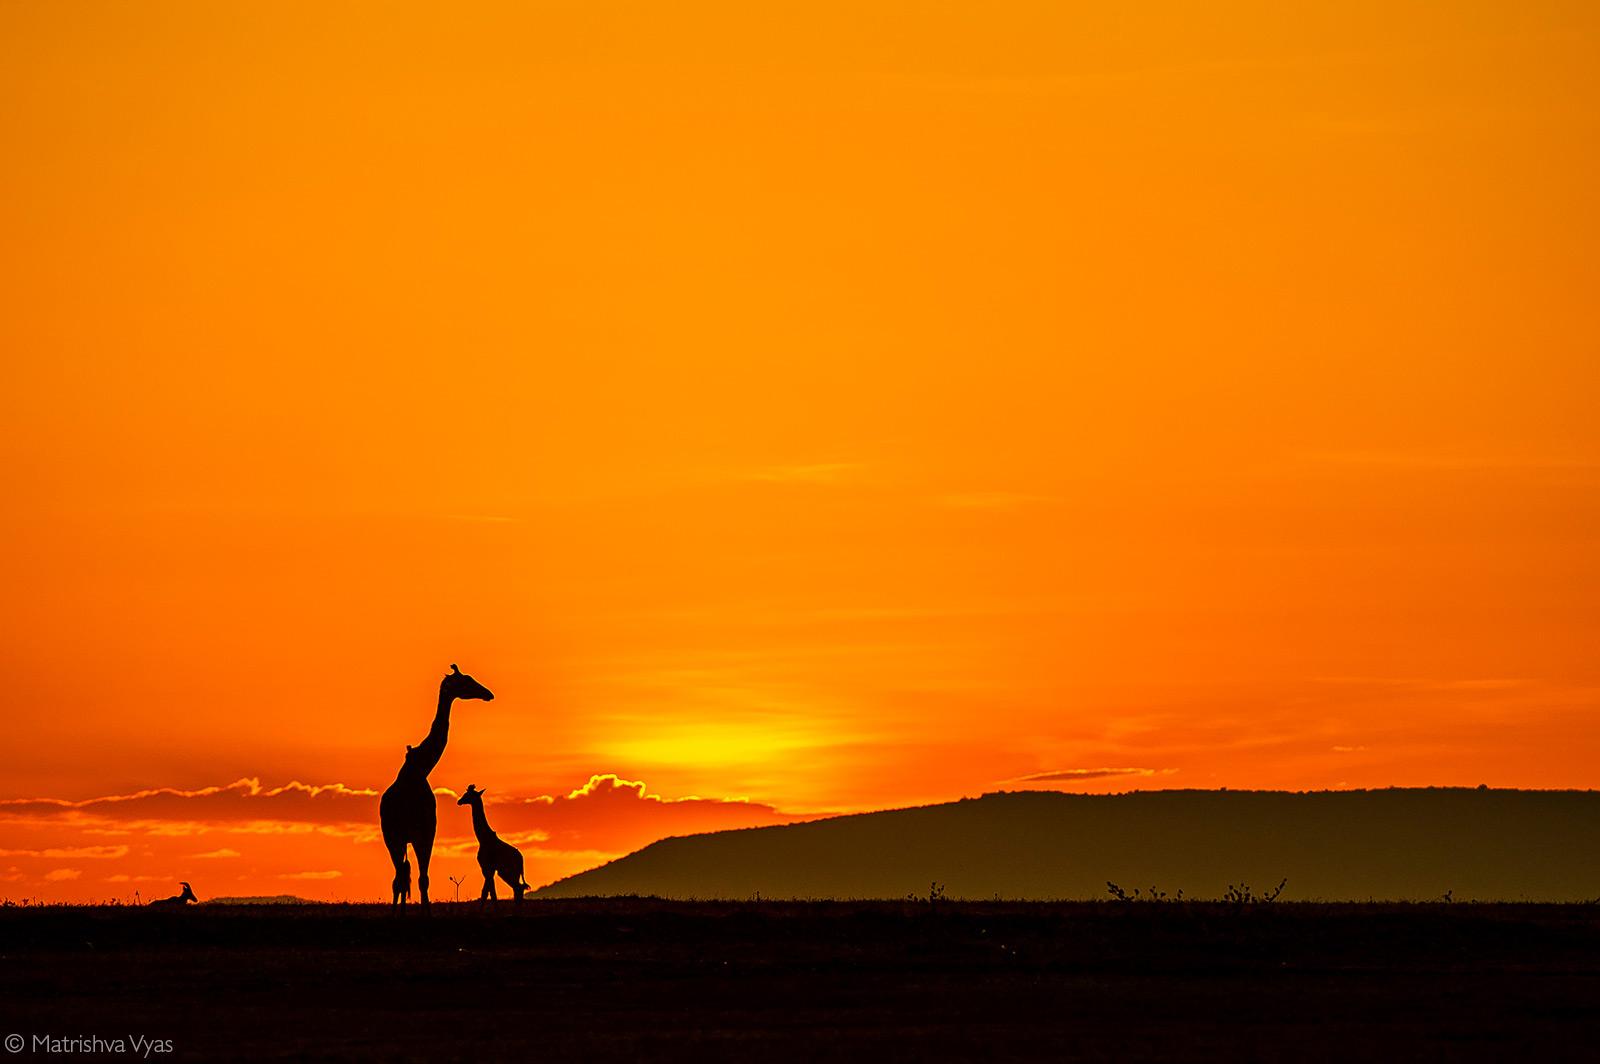 Silhouette of a giraffe mother and her baby. Maasai Mara National Reserve, Kenya © Matrishva Vyas